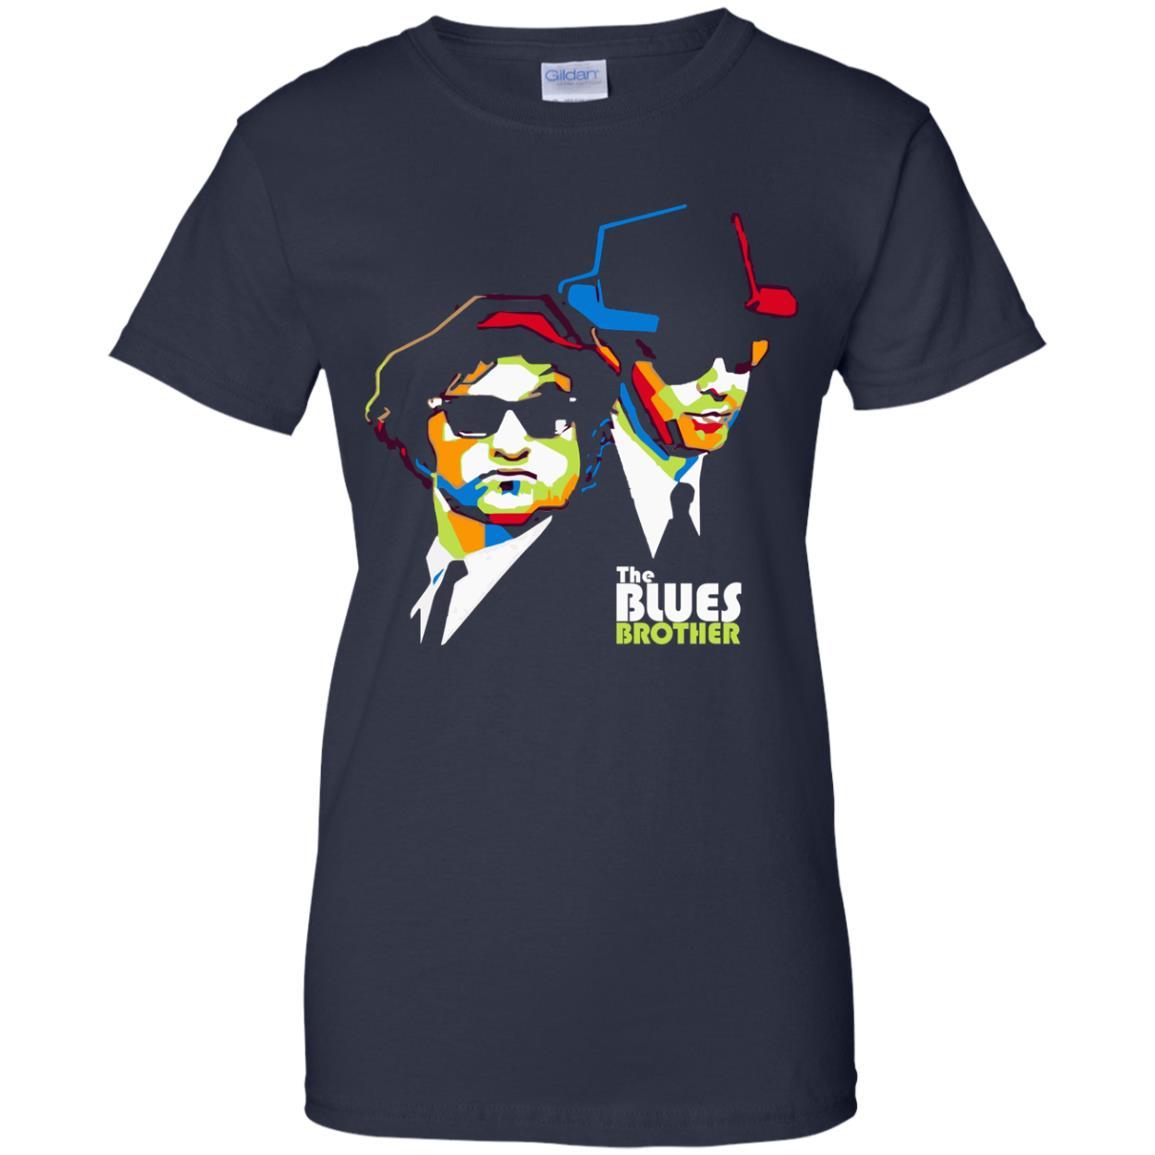 image 650 - The Blues Brother Shirt, Sweatshirt, Hoodie